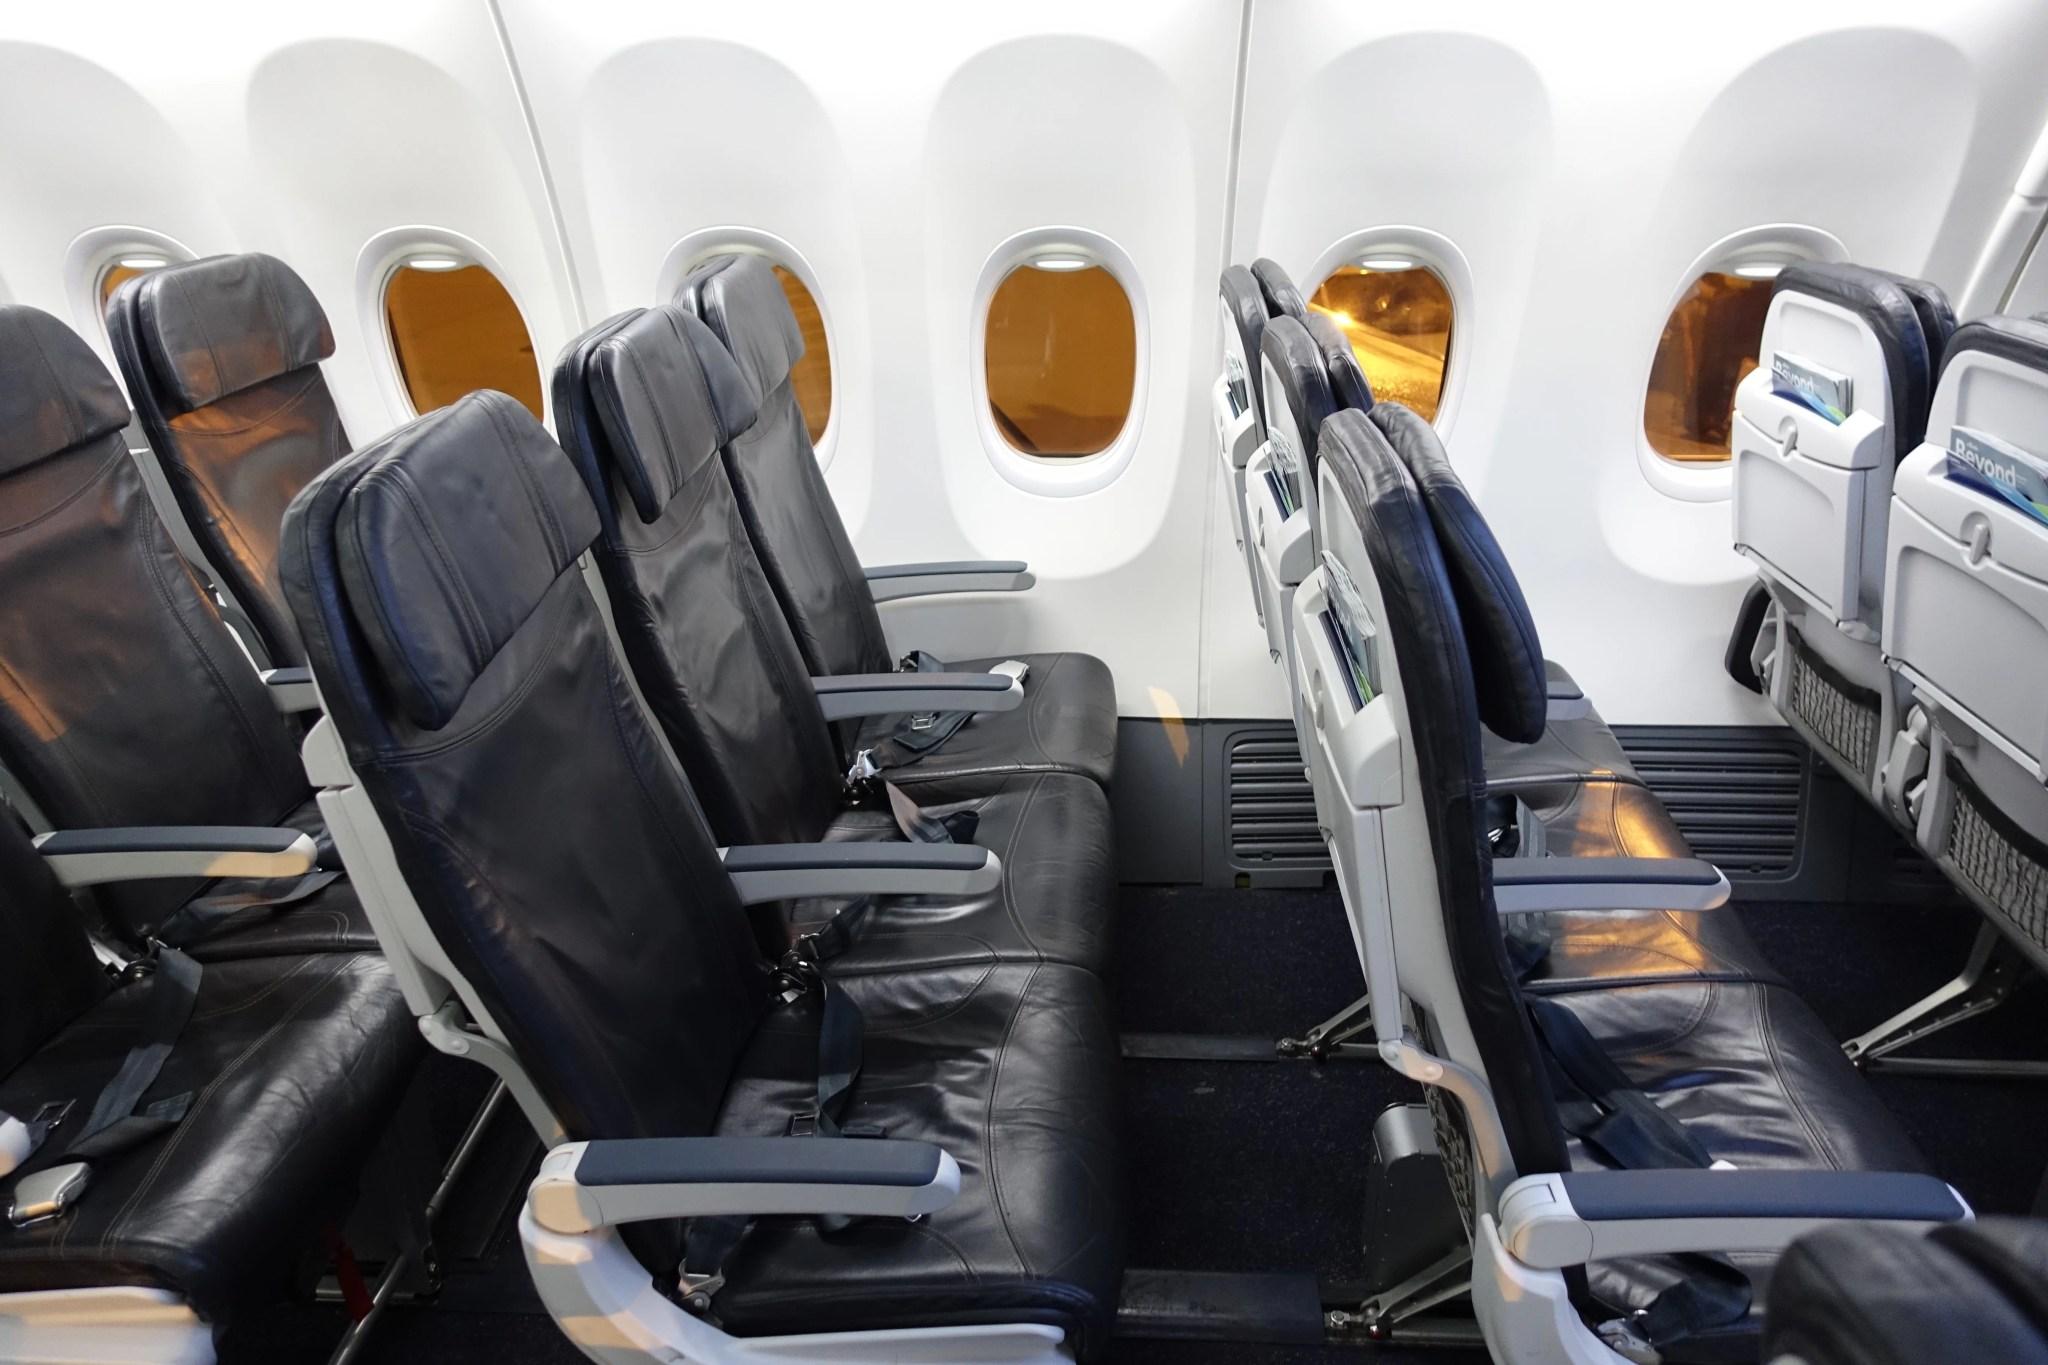 Flight Review: Alaska Airlines (737-900) Economy JFK to SEA